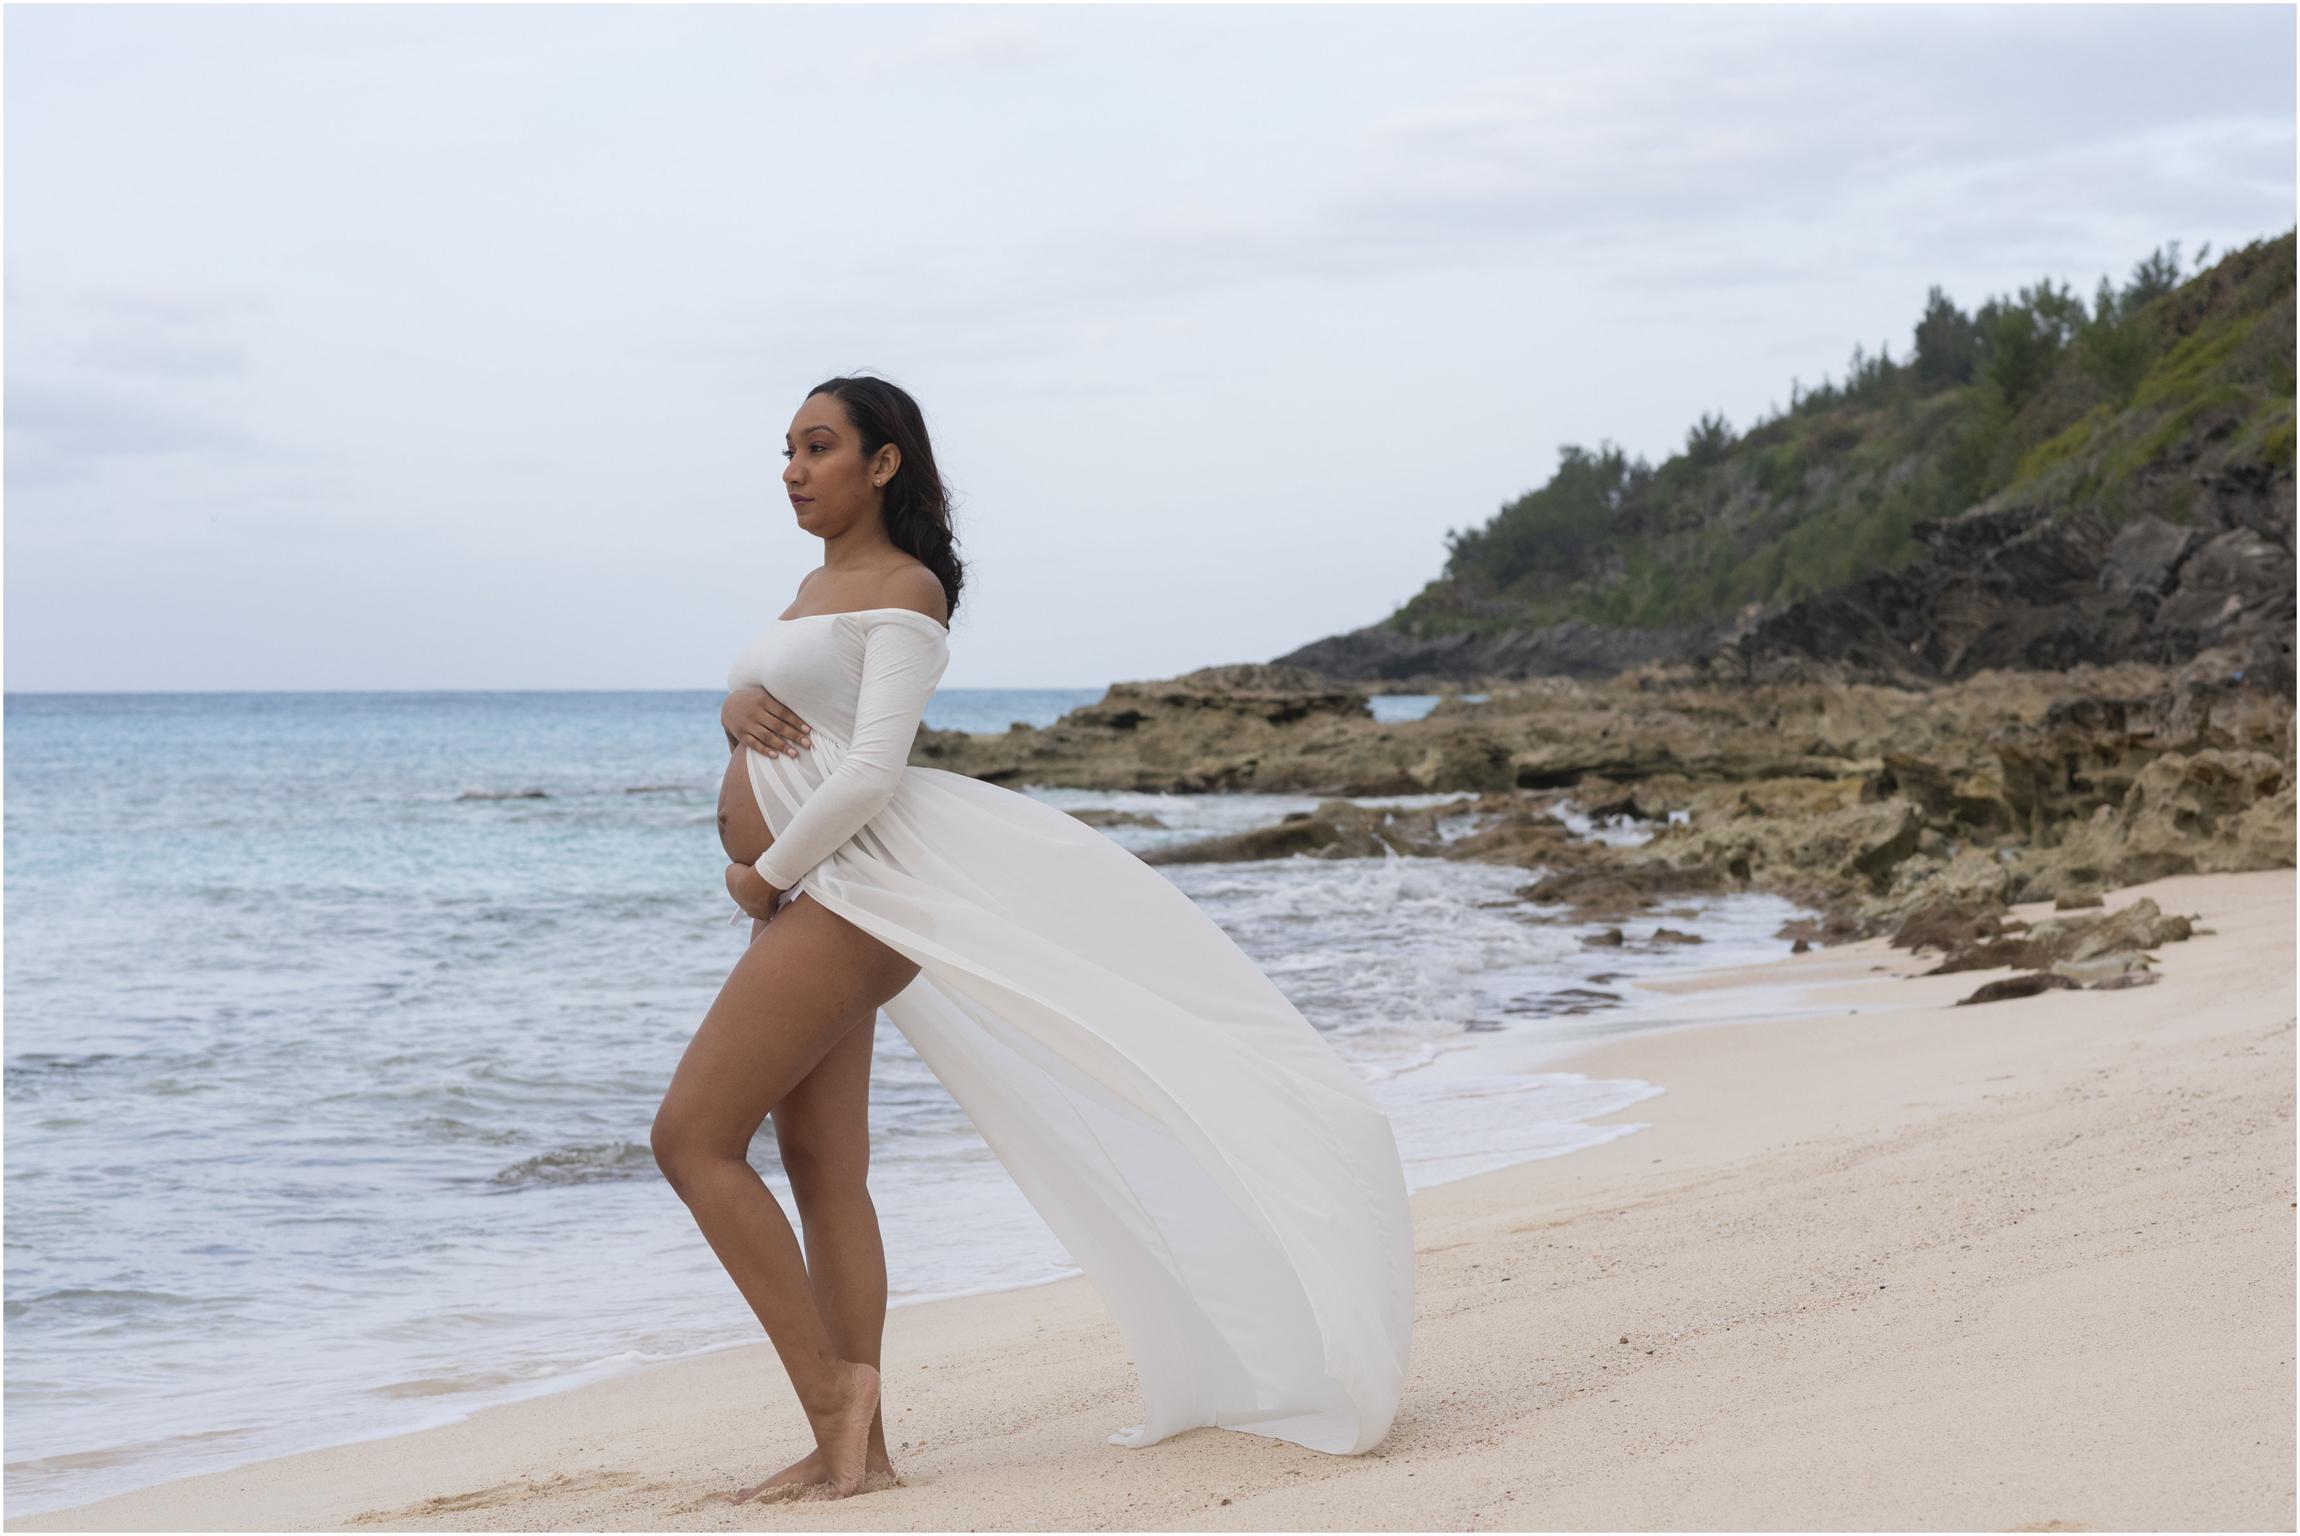 ©FianderFoto_Bermuda Maternity Photographer_Church Bay Beach_Tiffany_007.jpg